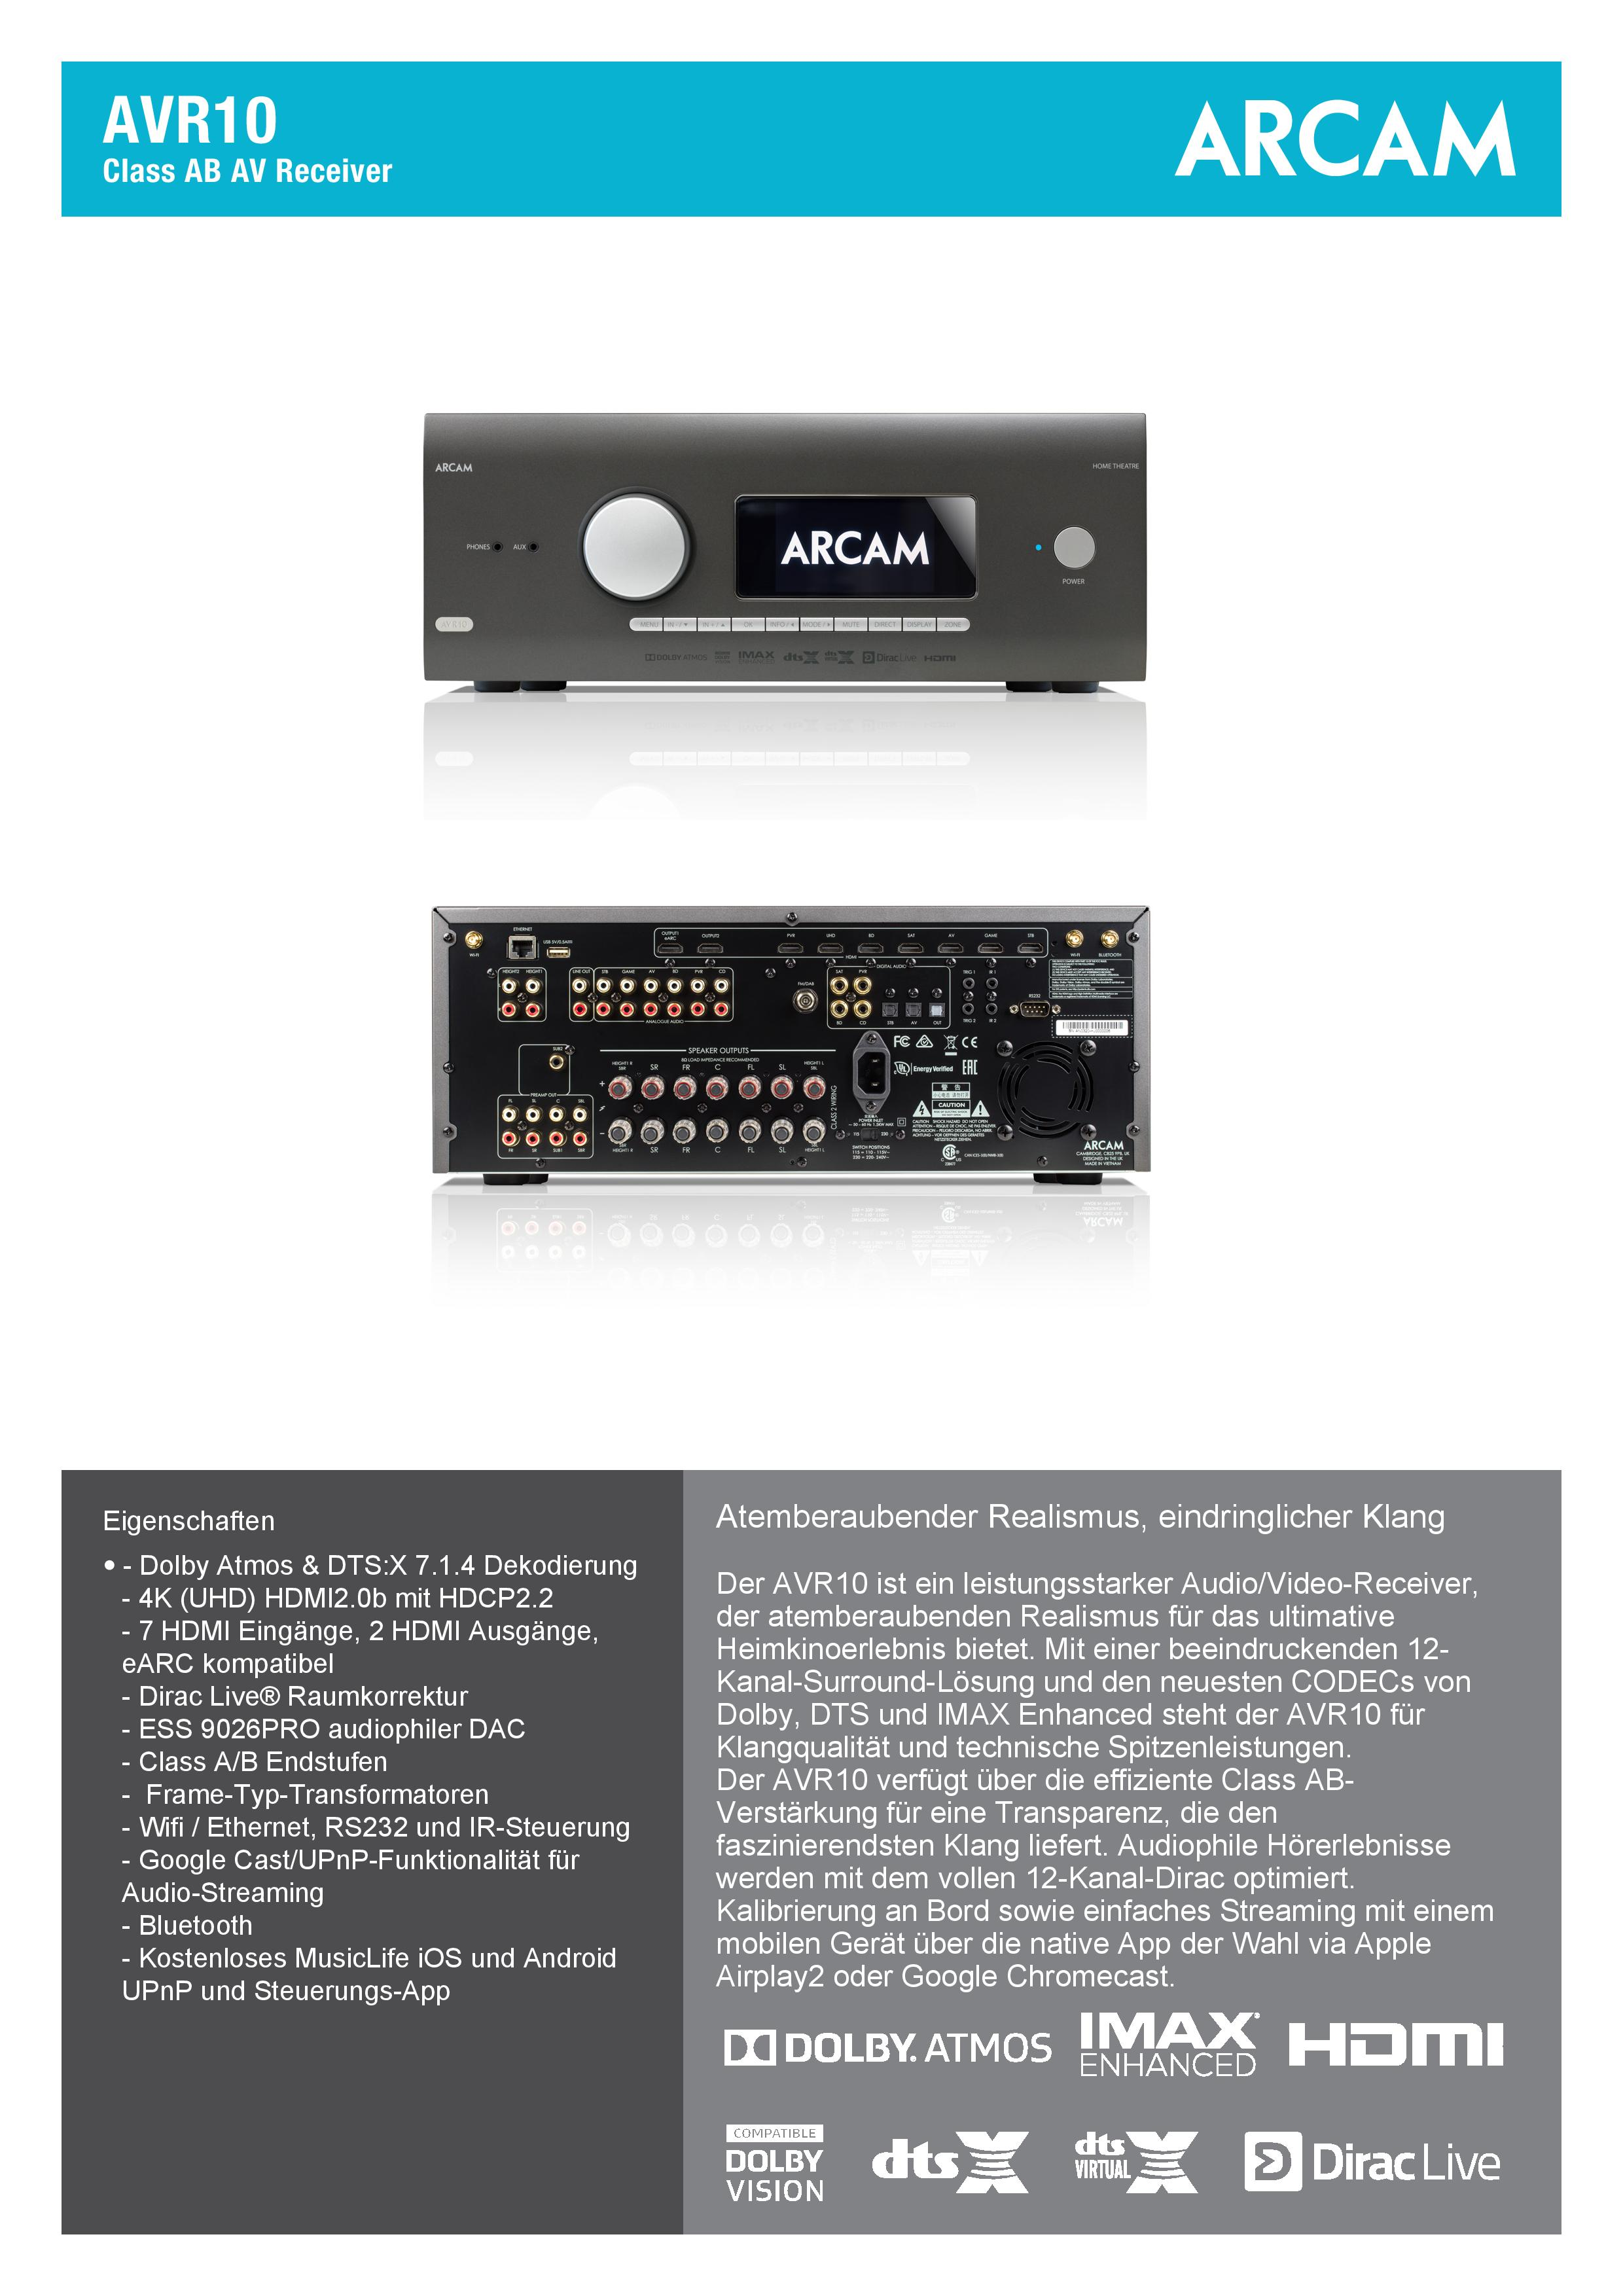 ARCAM-AVR10-Spec_DE-page-001